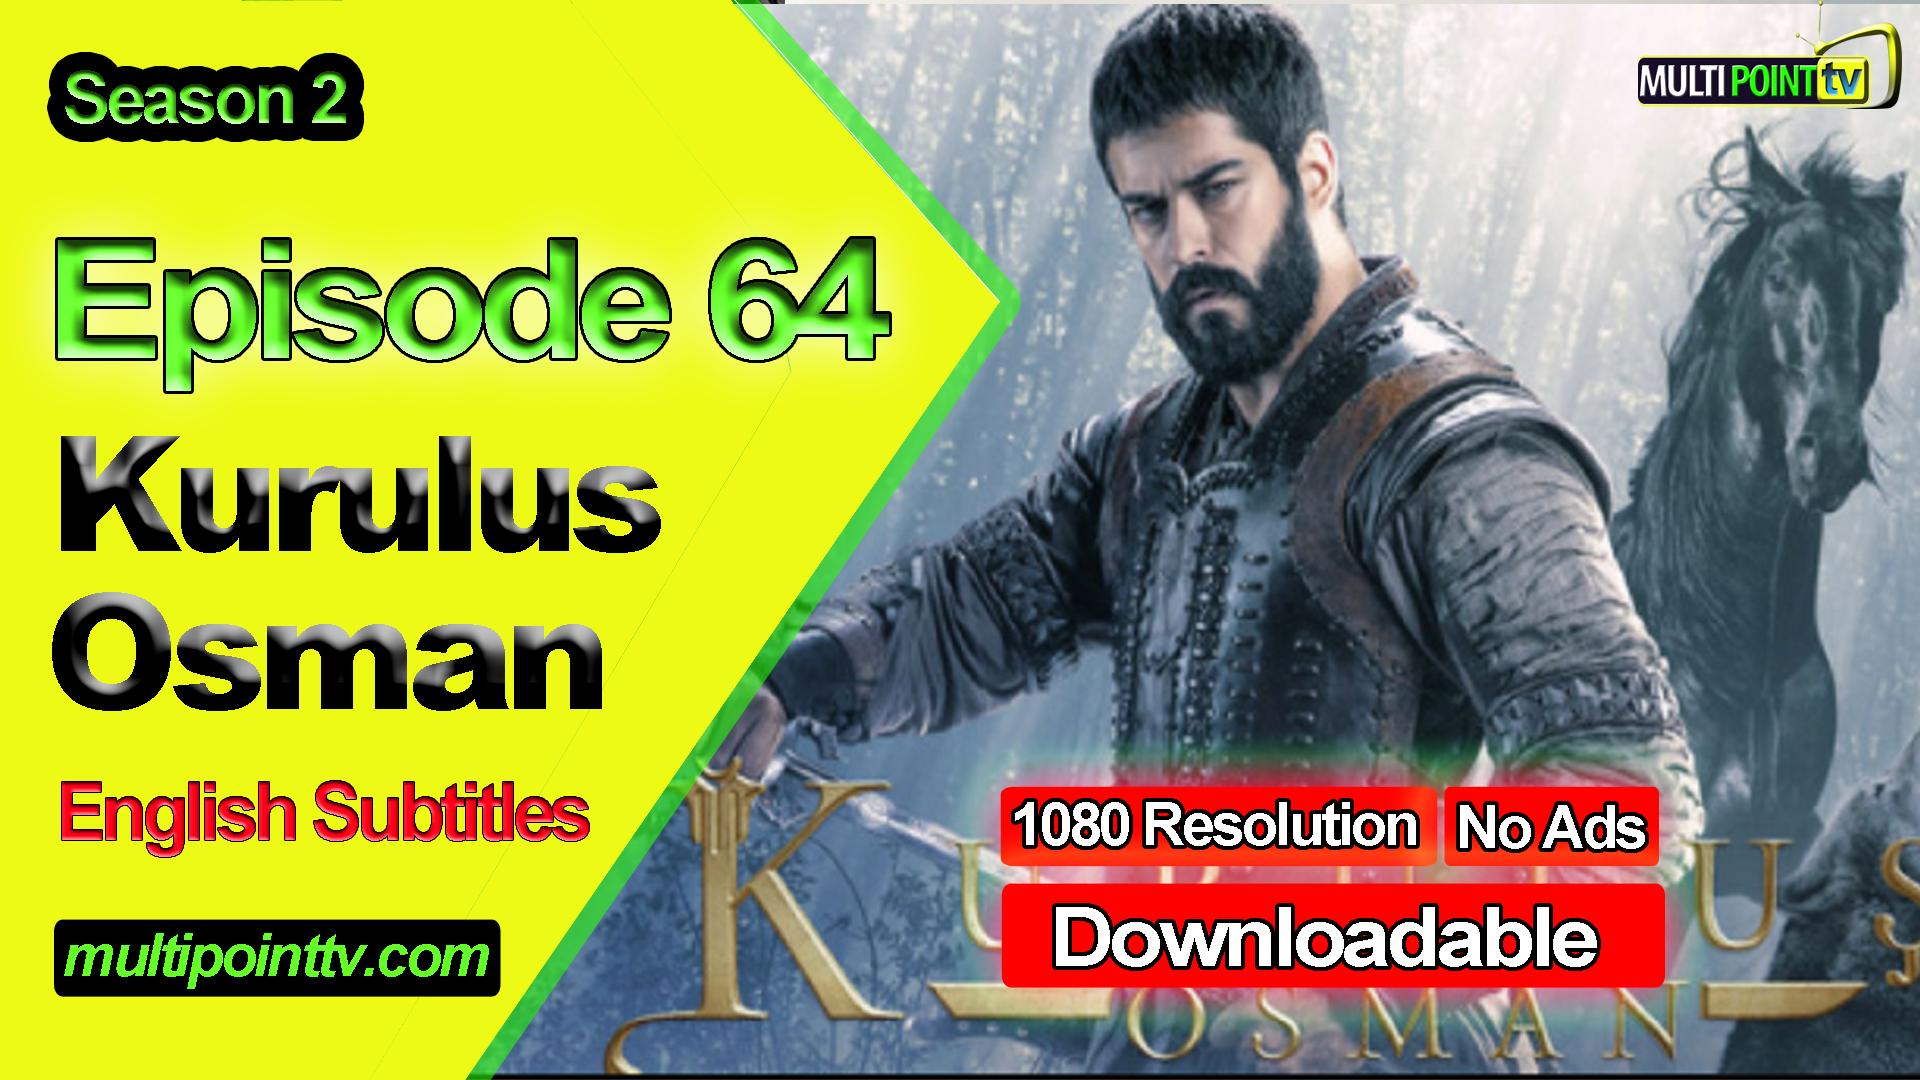 Kurulus Osman Episode 64 English Subtitles (Last Episode)